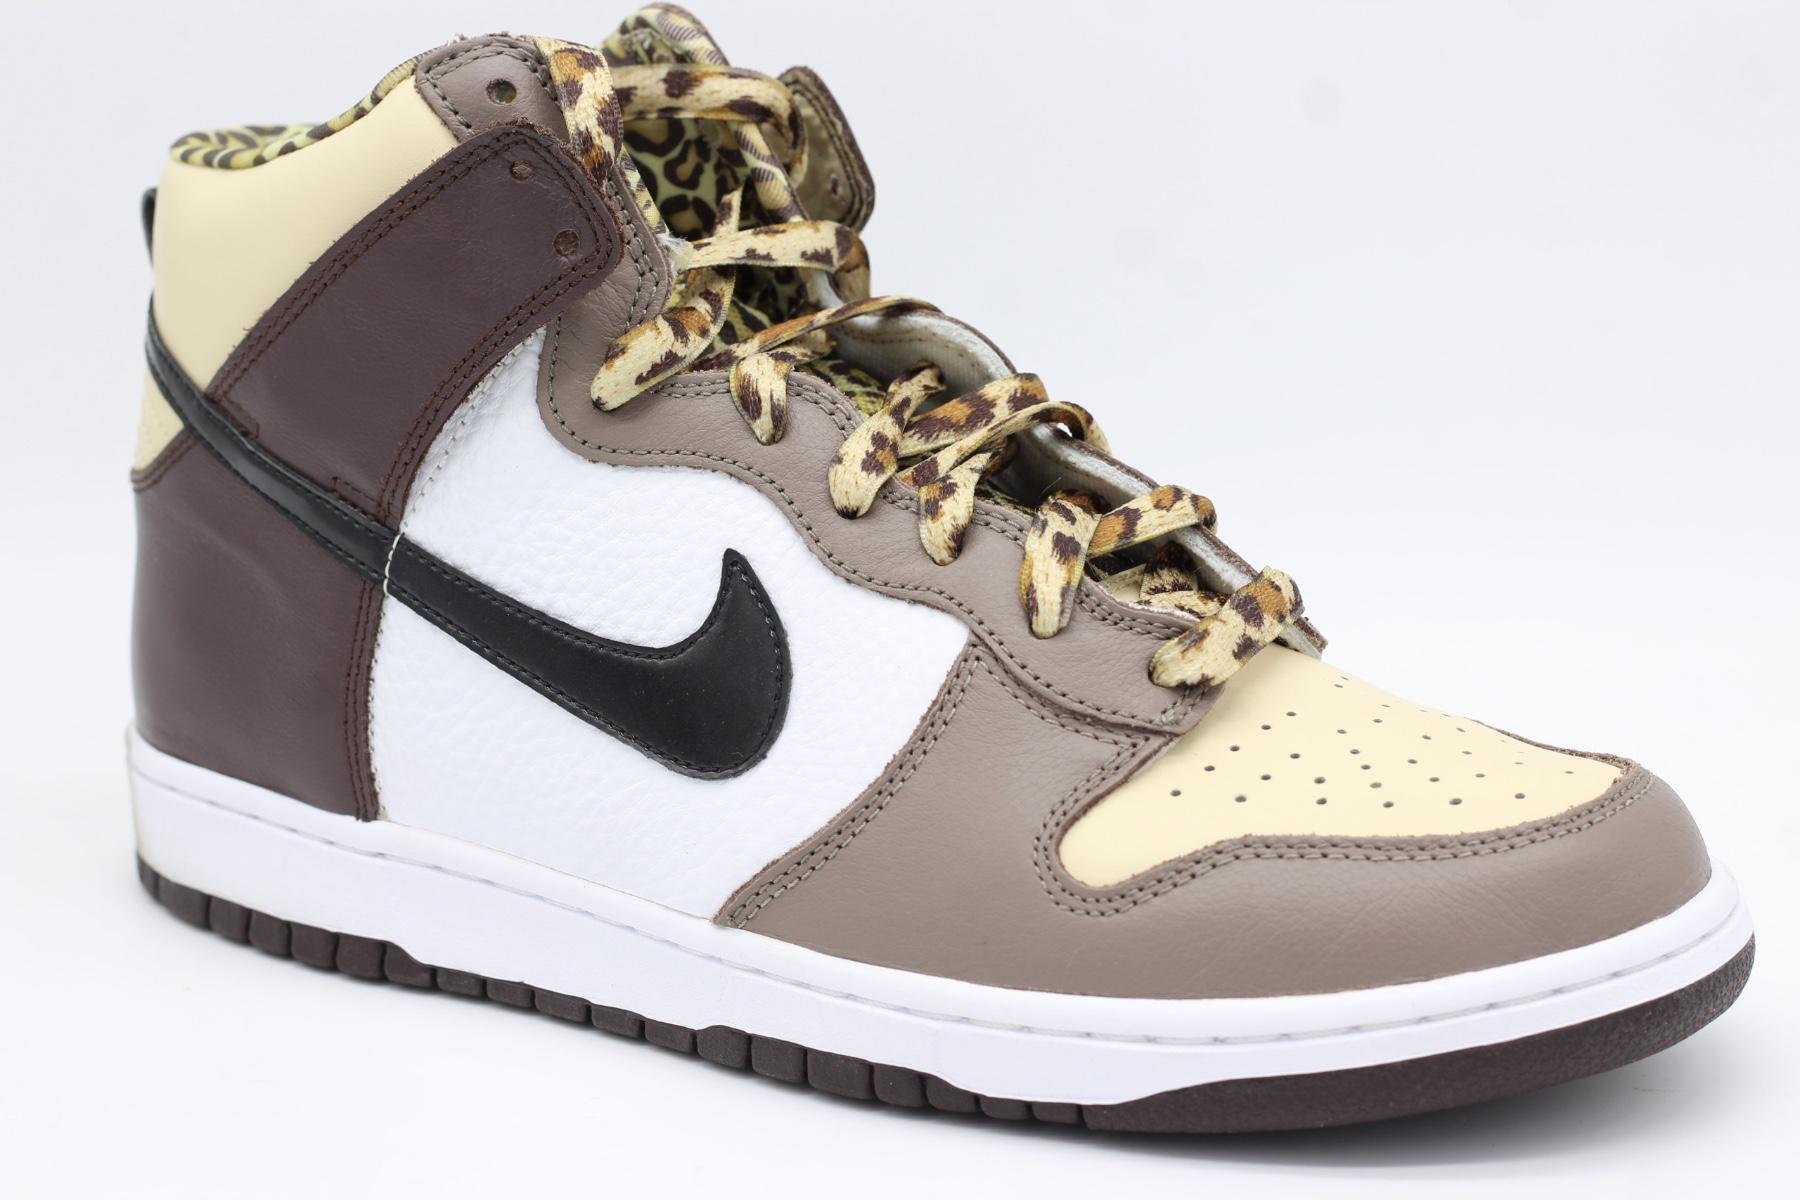 Nike Dunk SB High Ferris Bueller